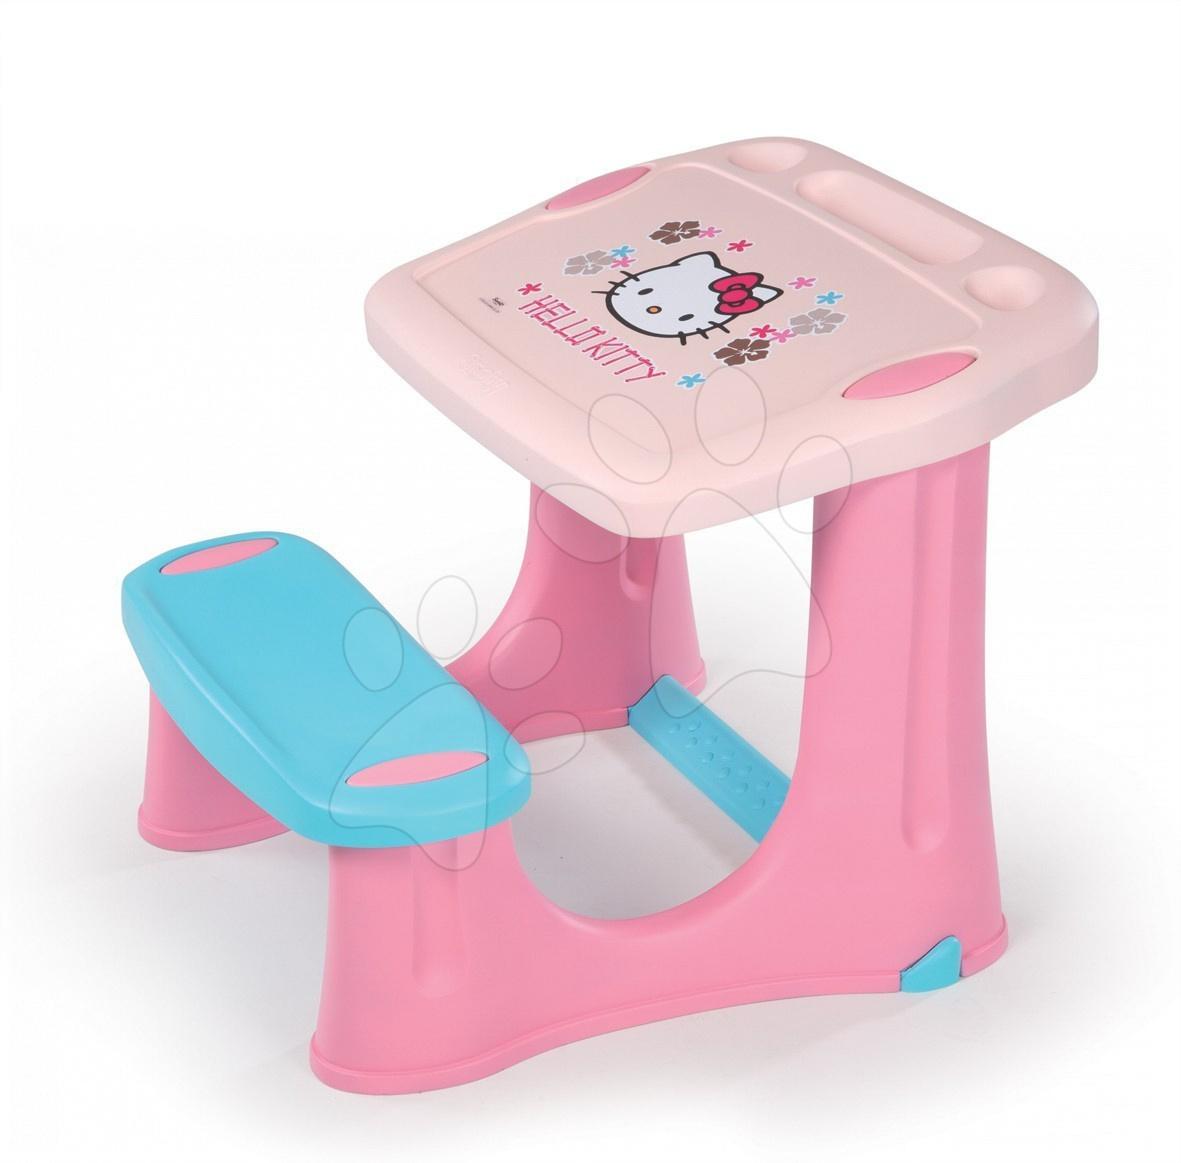 Školní lavice Hello Kitty Smoby s 20 doplňky růžovo-modrá